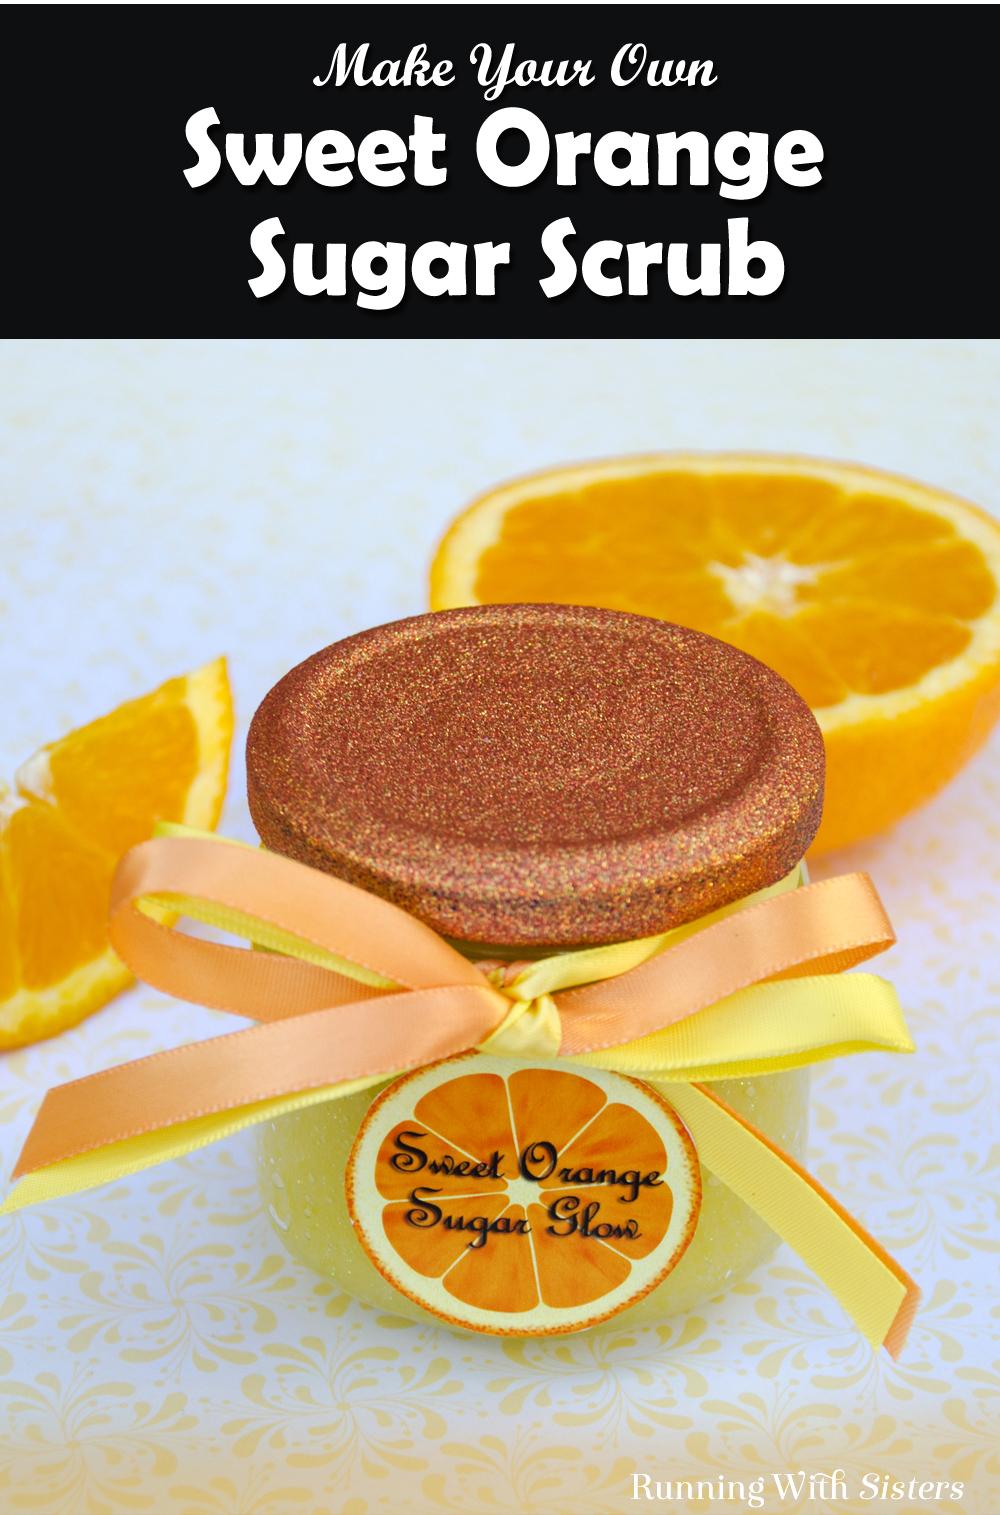 Make a pretty orange sugar scrub pretty this glittery sugar scrub with a cute printable label. The sugar blend inside really sparkles!